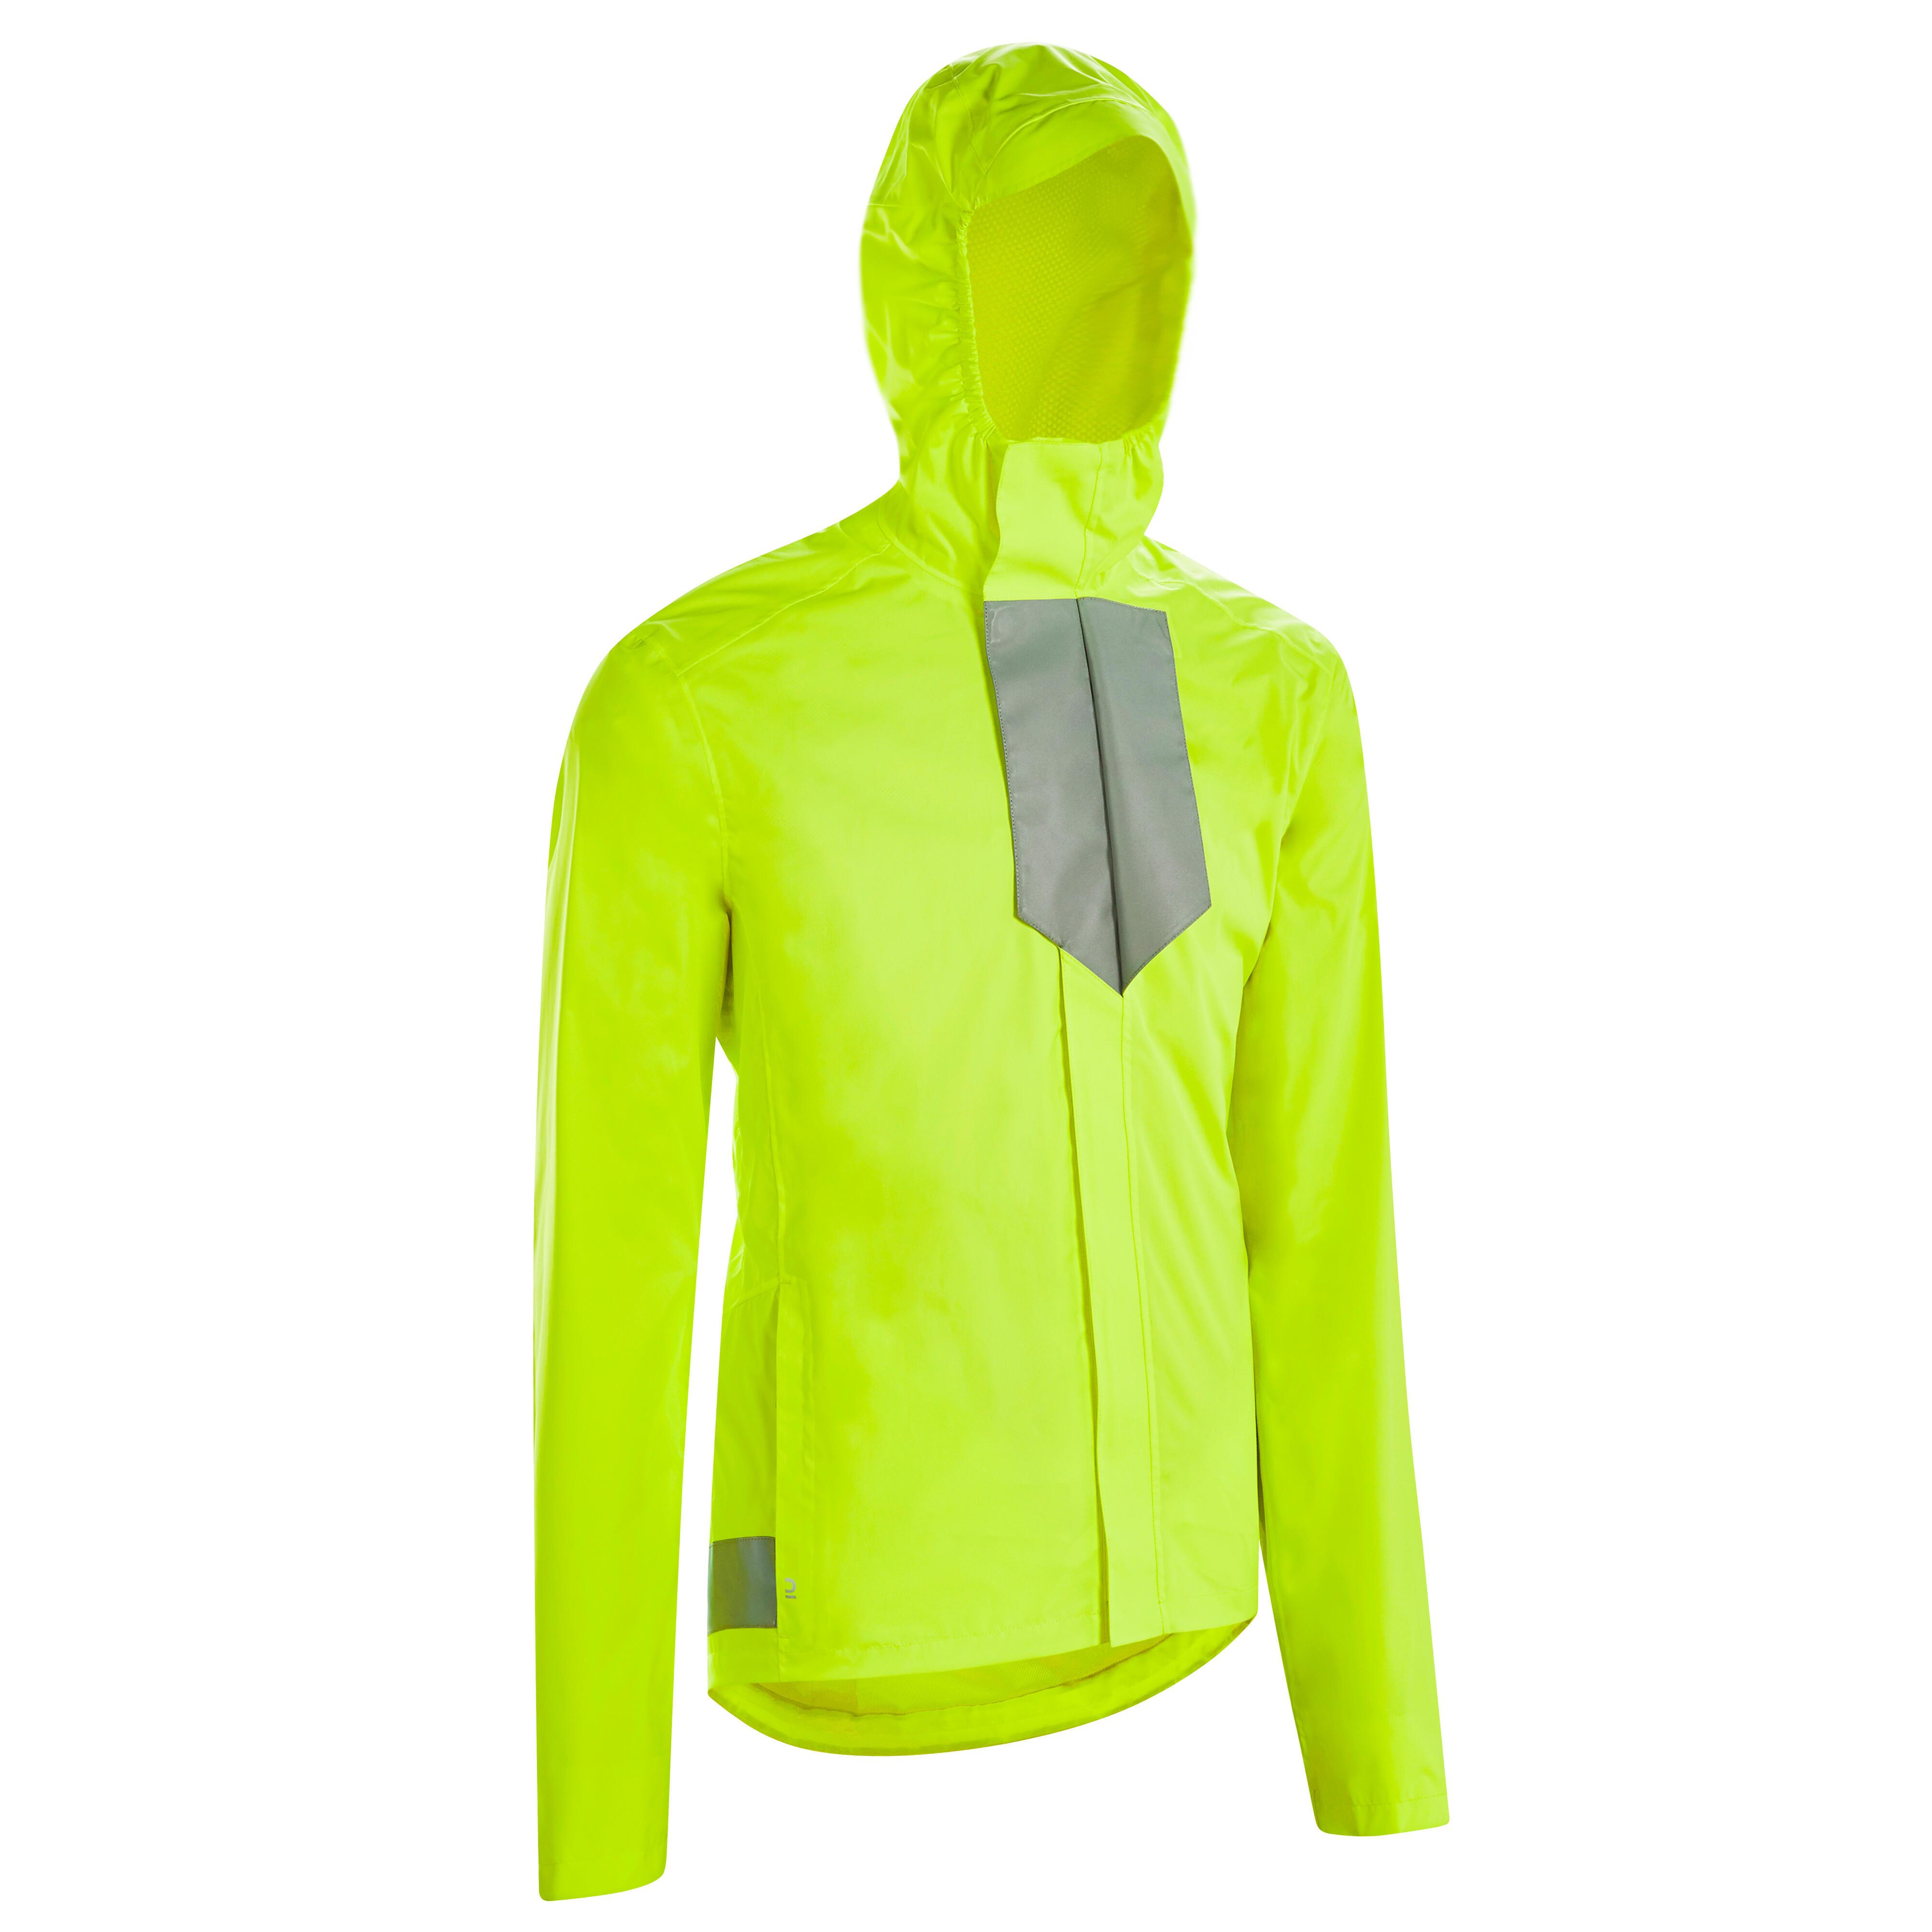 Jachetă ploaie 500 EPI Bărbați imagine